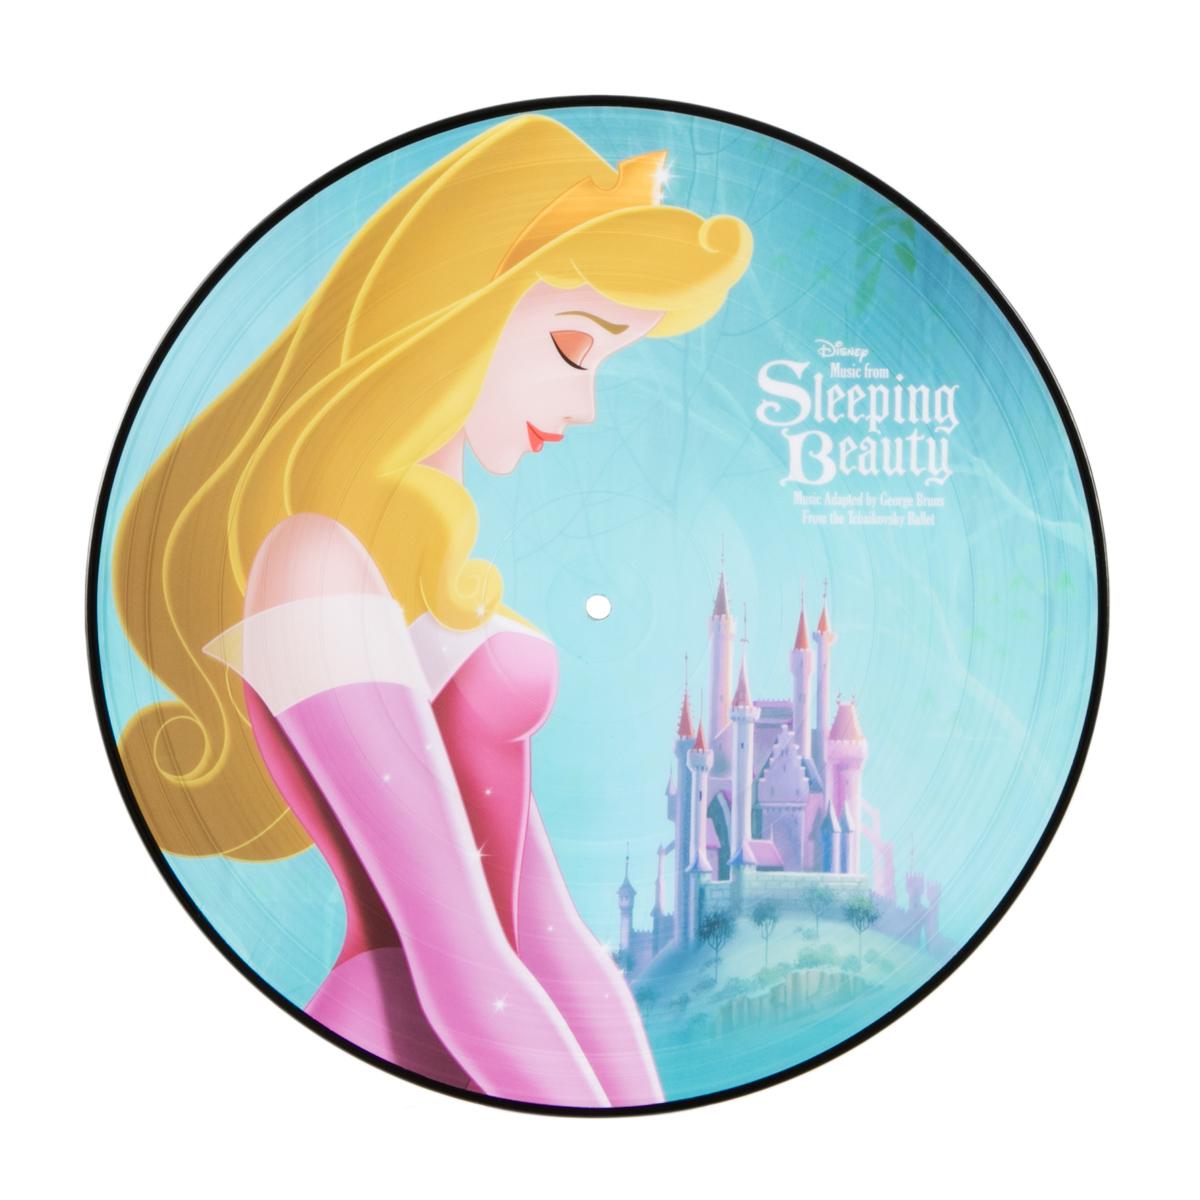 Sleeping Beauty Picture Vinyl